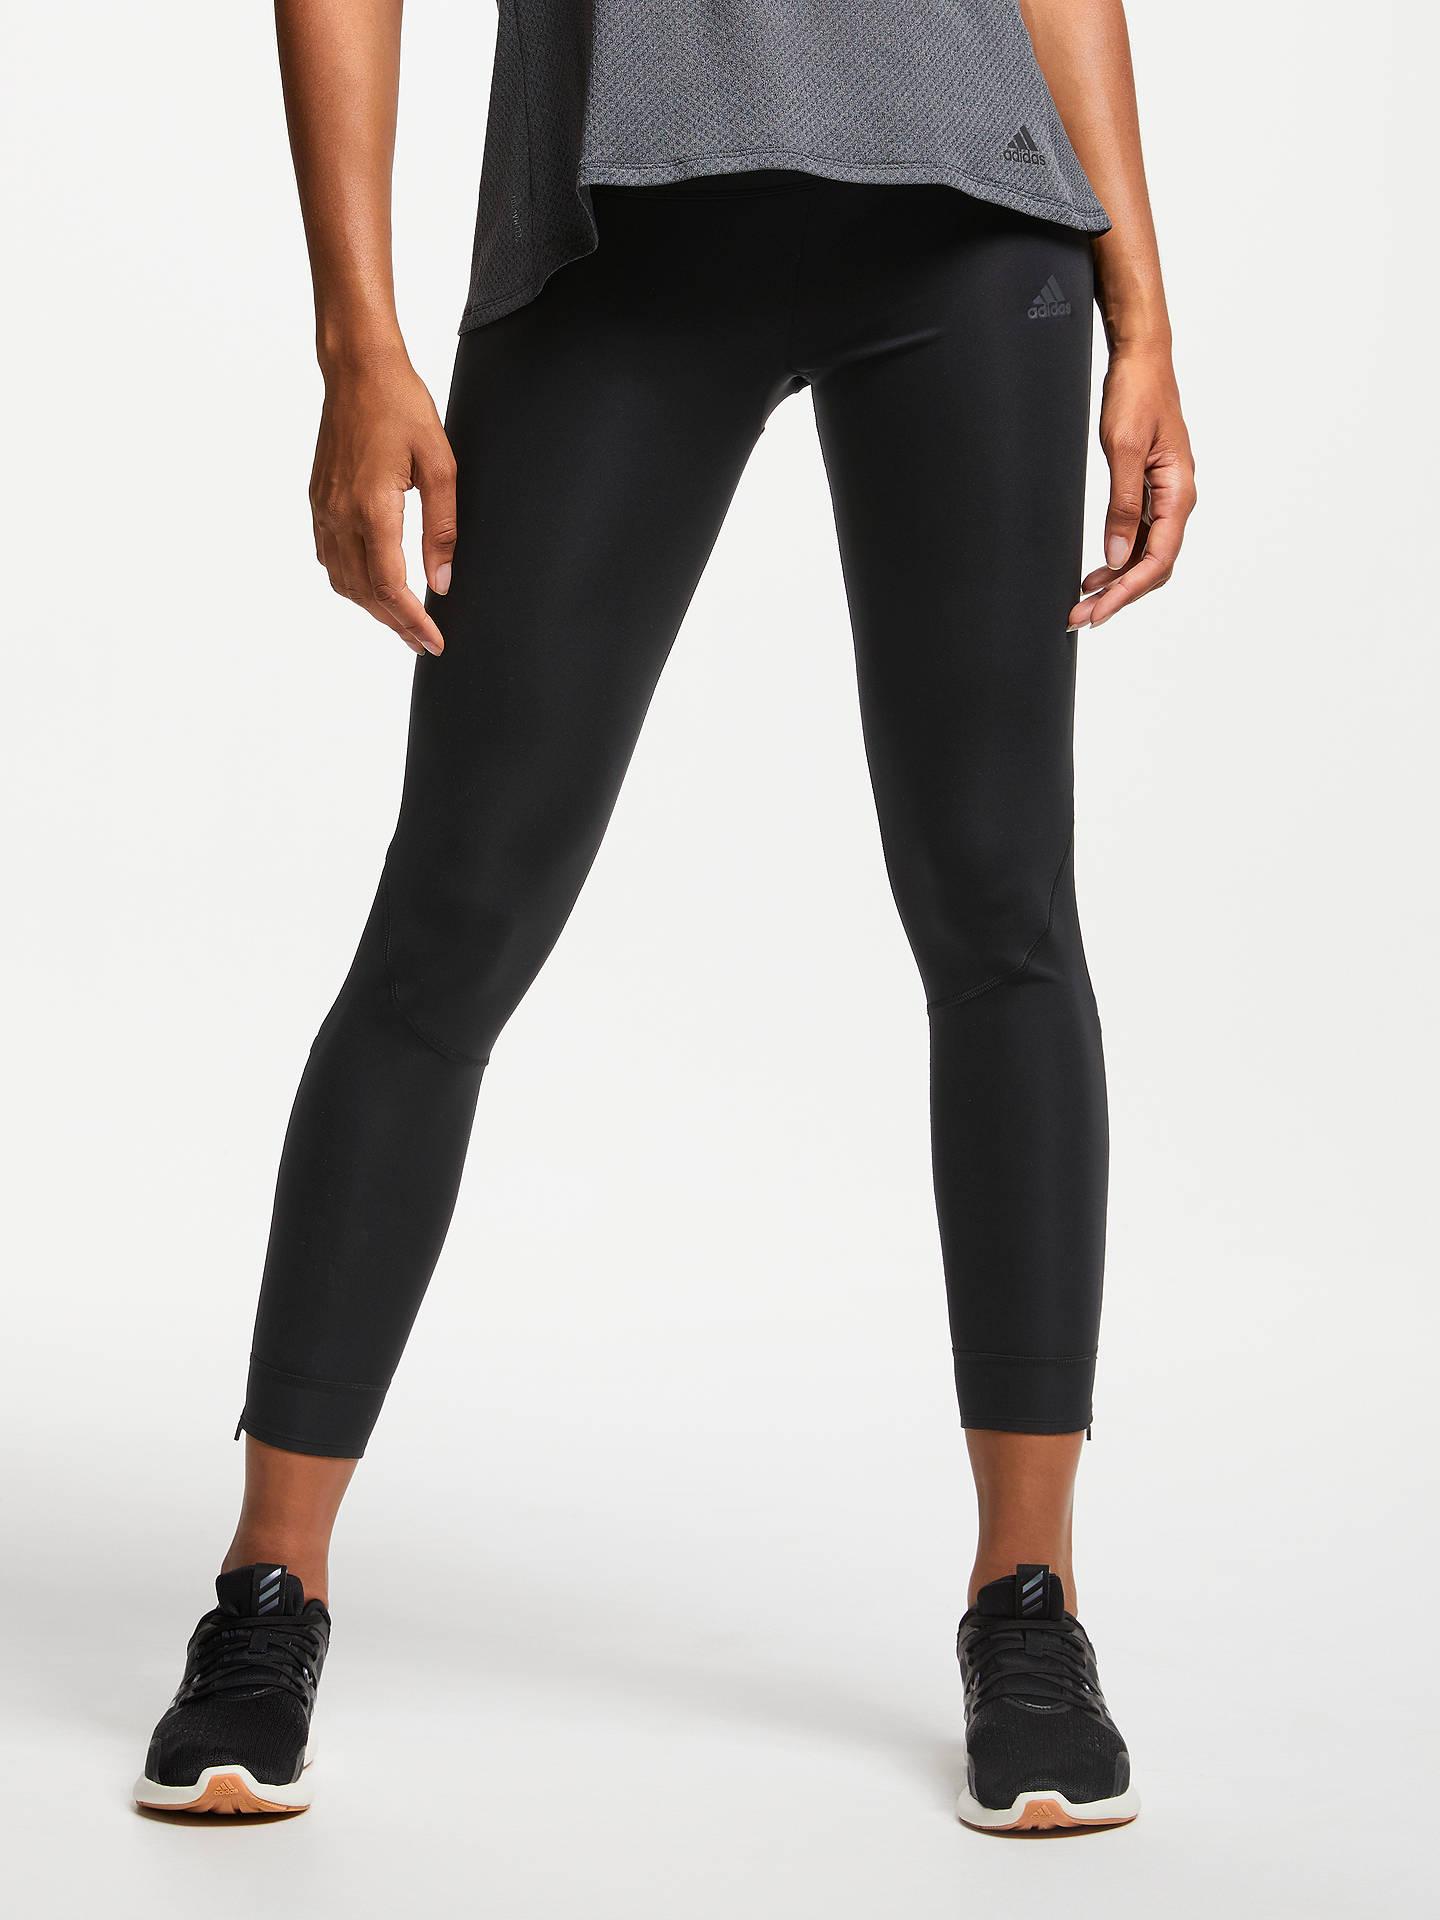 Edad adulta motivo buscar  adidas Own The Run Long Running Tights, Black at John Lewis & Partners